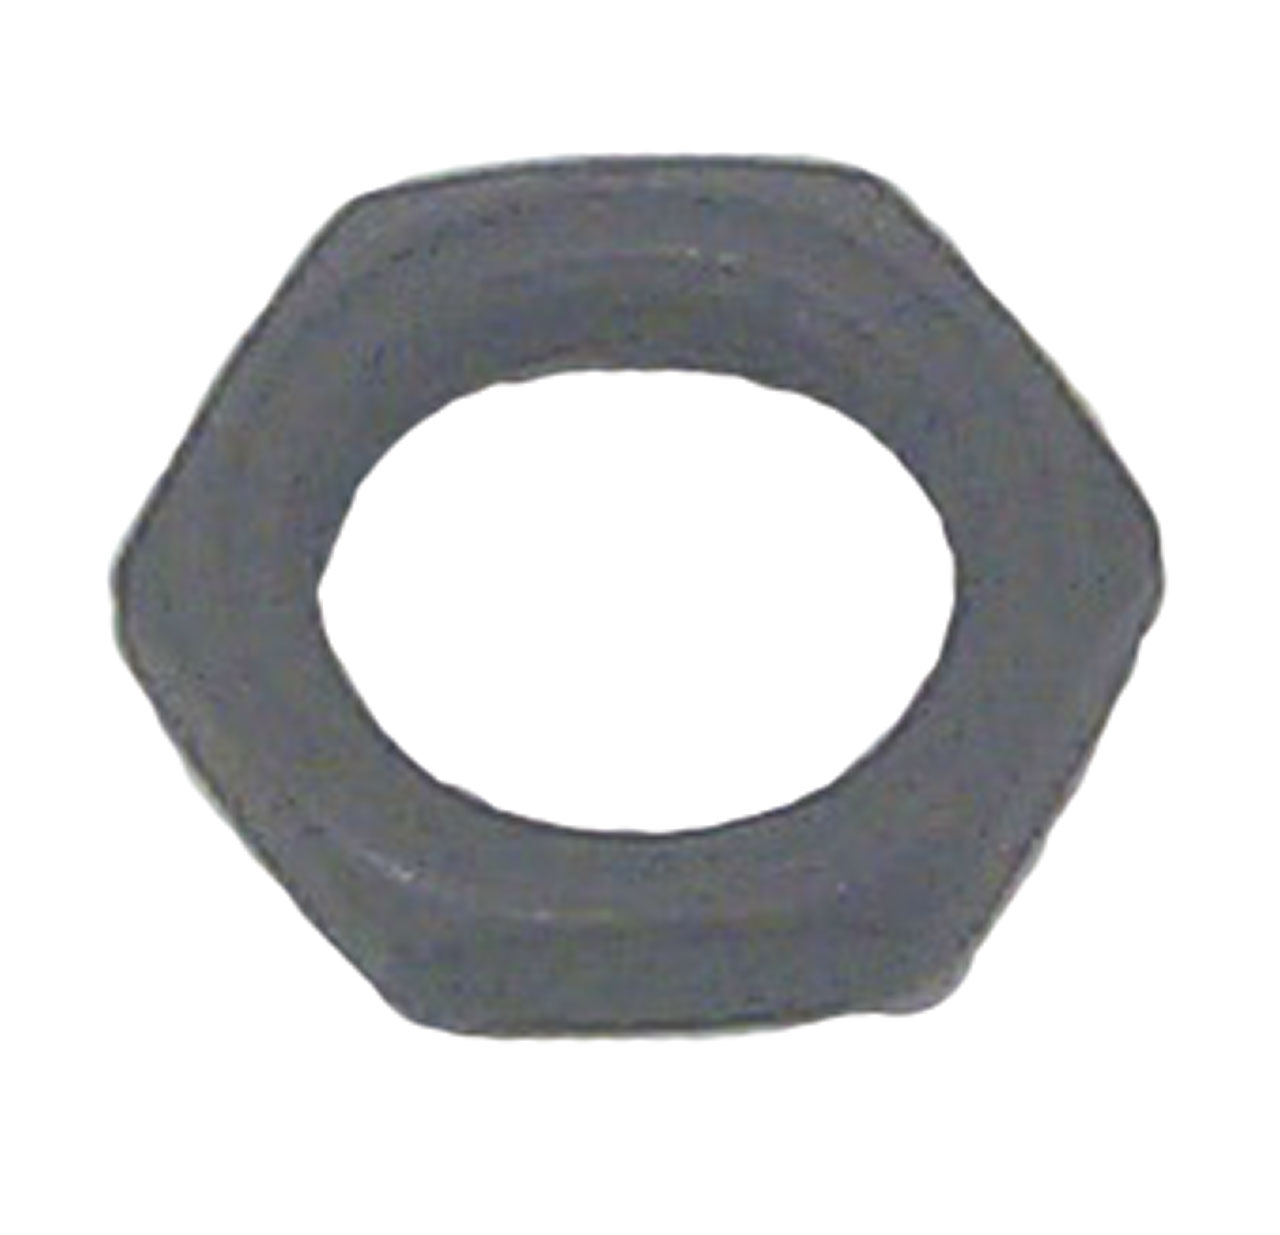 OMC Intermediate Housing Seal Kit 18-2669